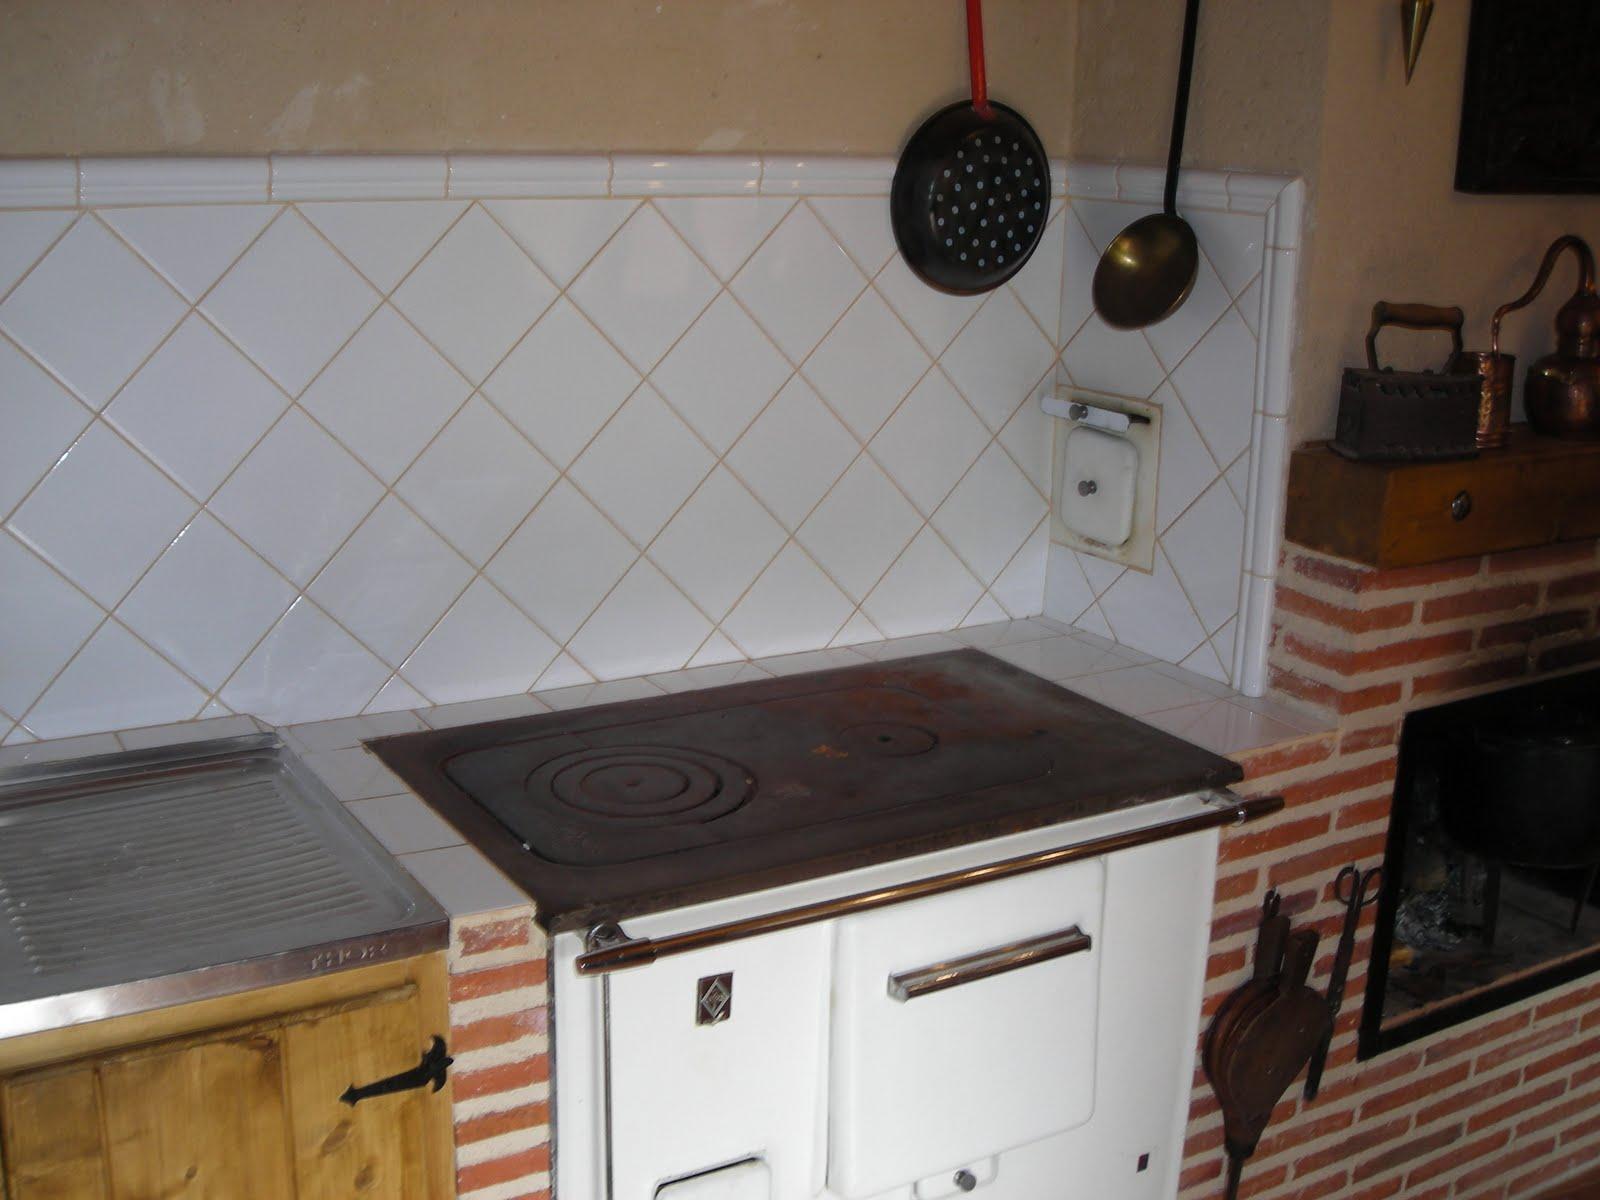 El ti joaqu n com abril 2010 - Cocinas rusticas de obra fotos ...